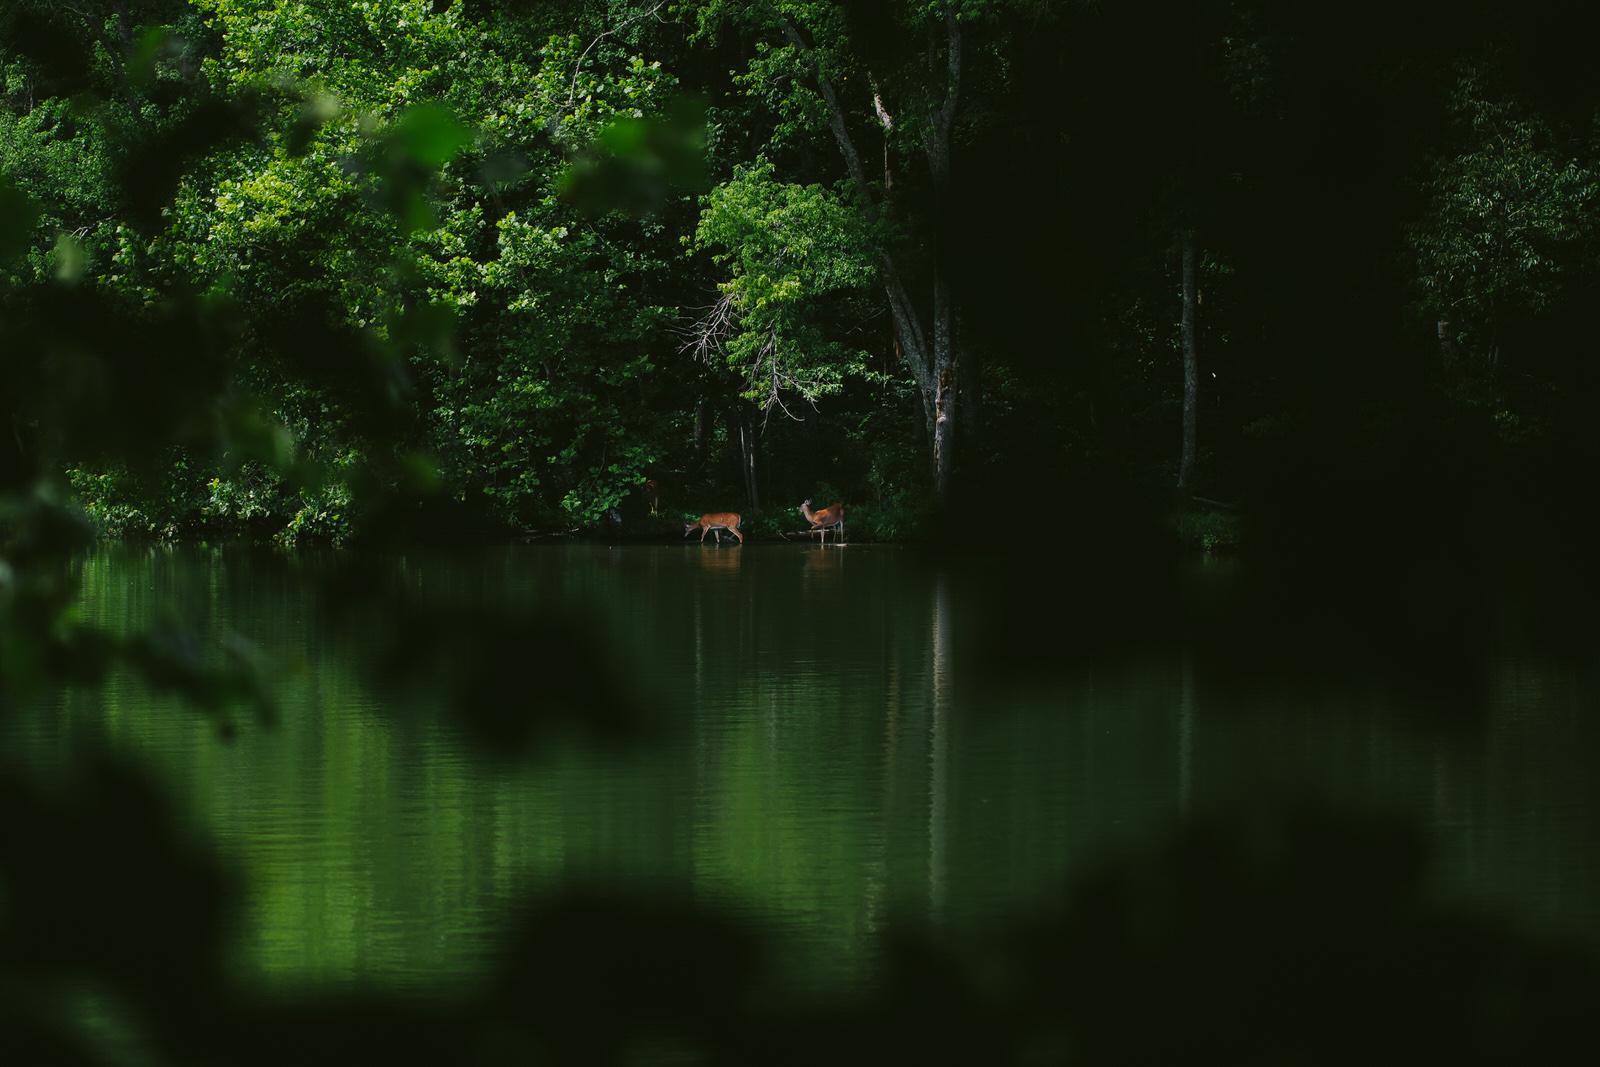 radnor-lake-deer-nature-hiking-tiny-house-photo.jpg